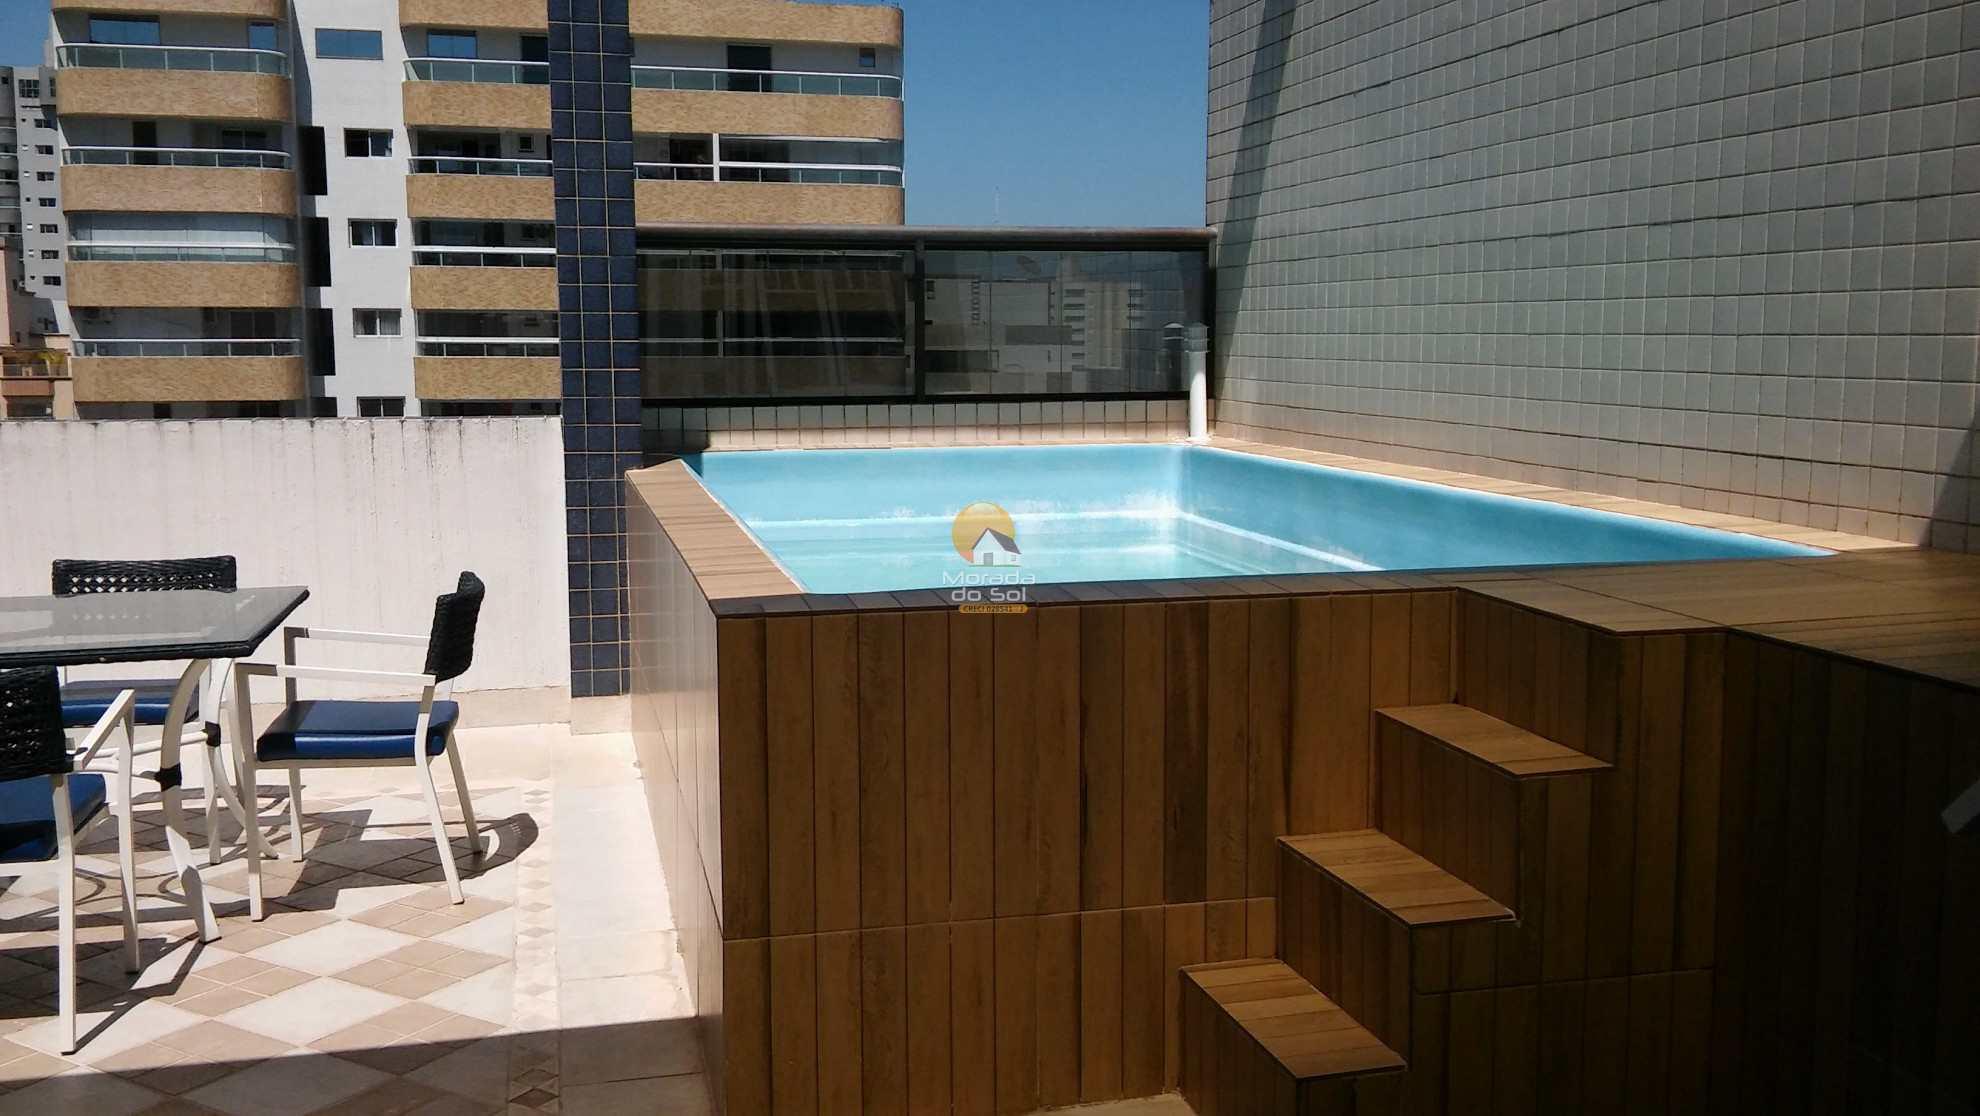 31 piscina da cobertura